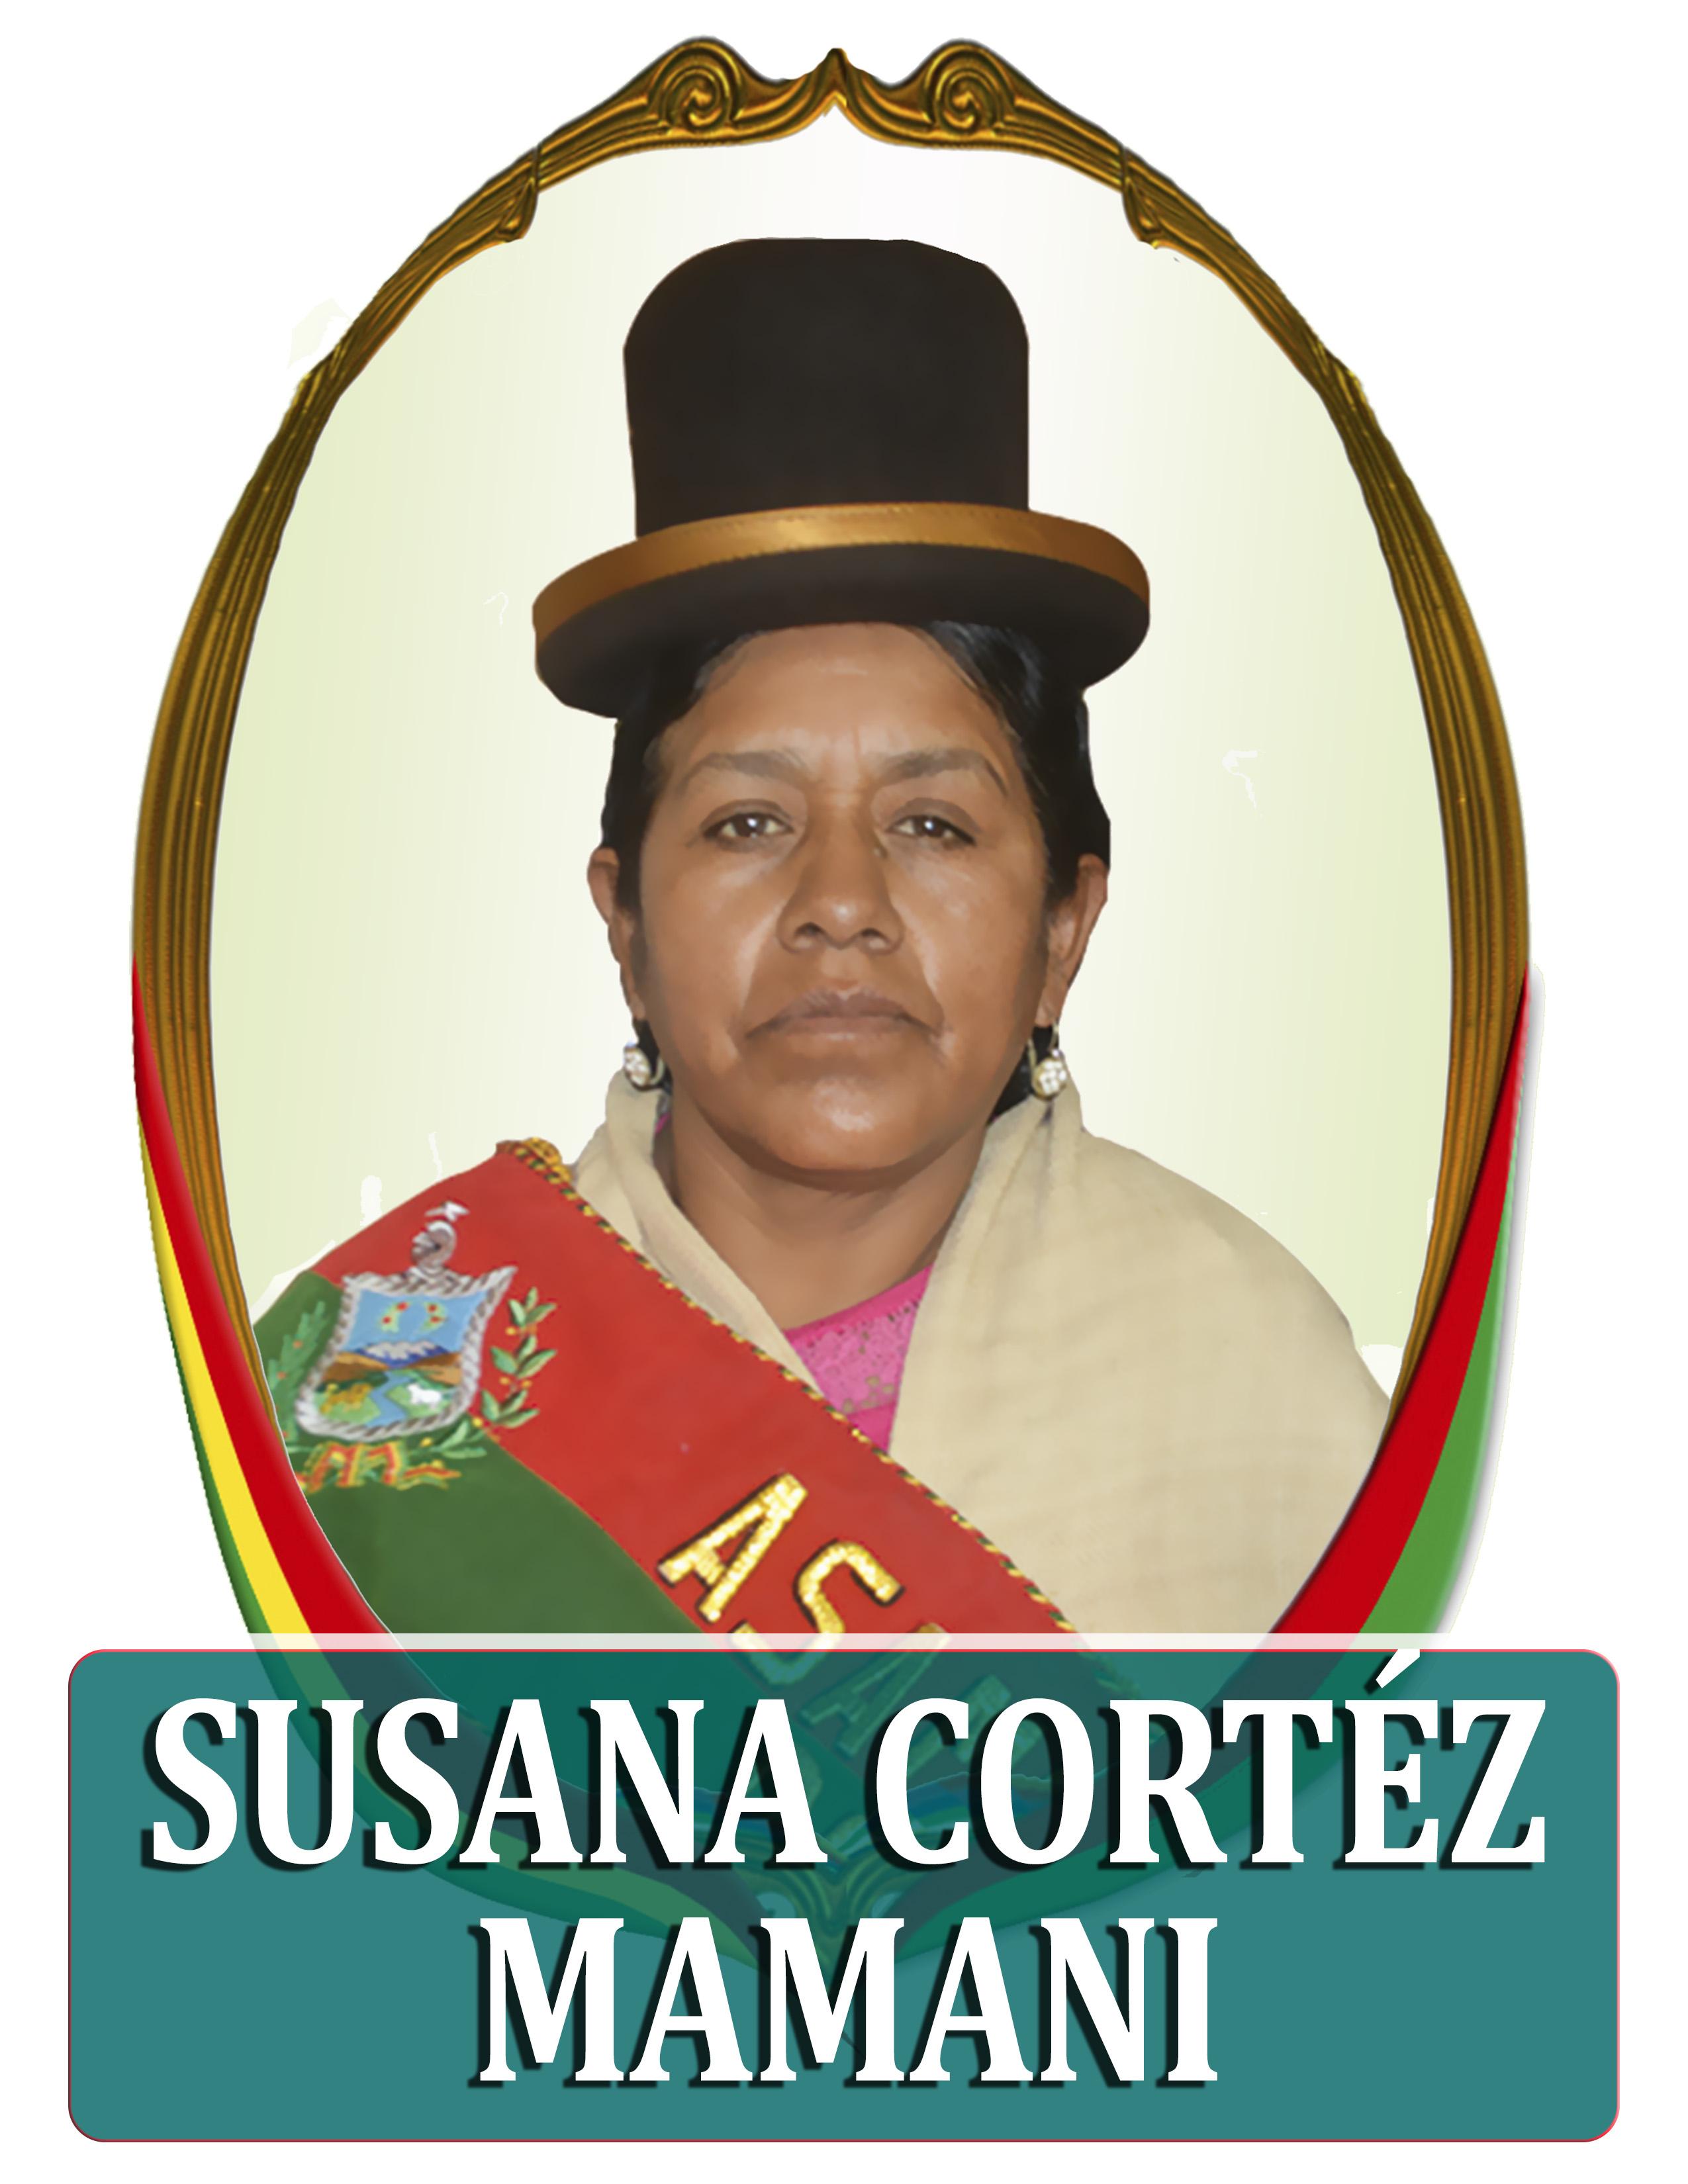 SUSANA CORTÉZ MAMANI